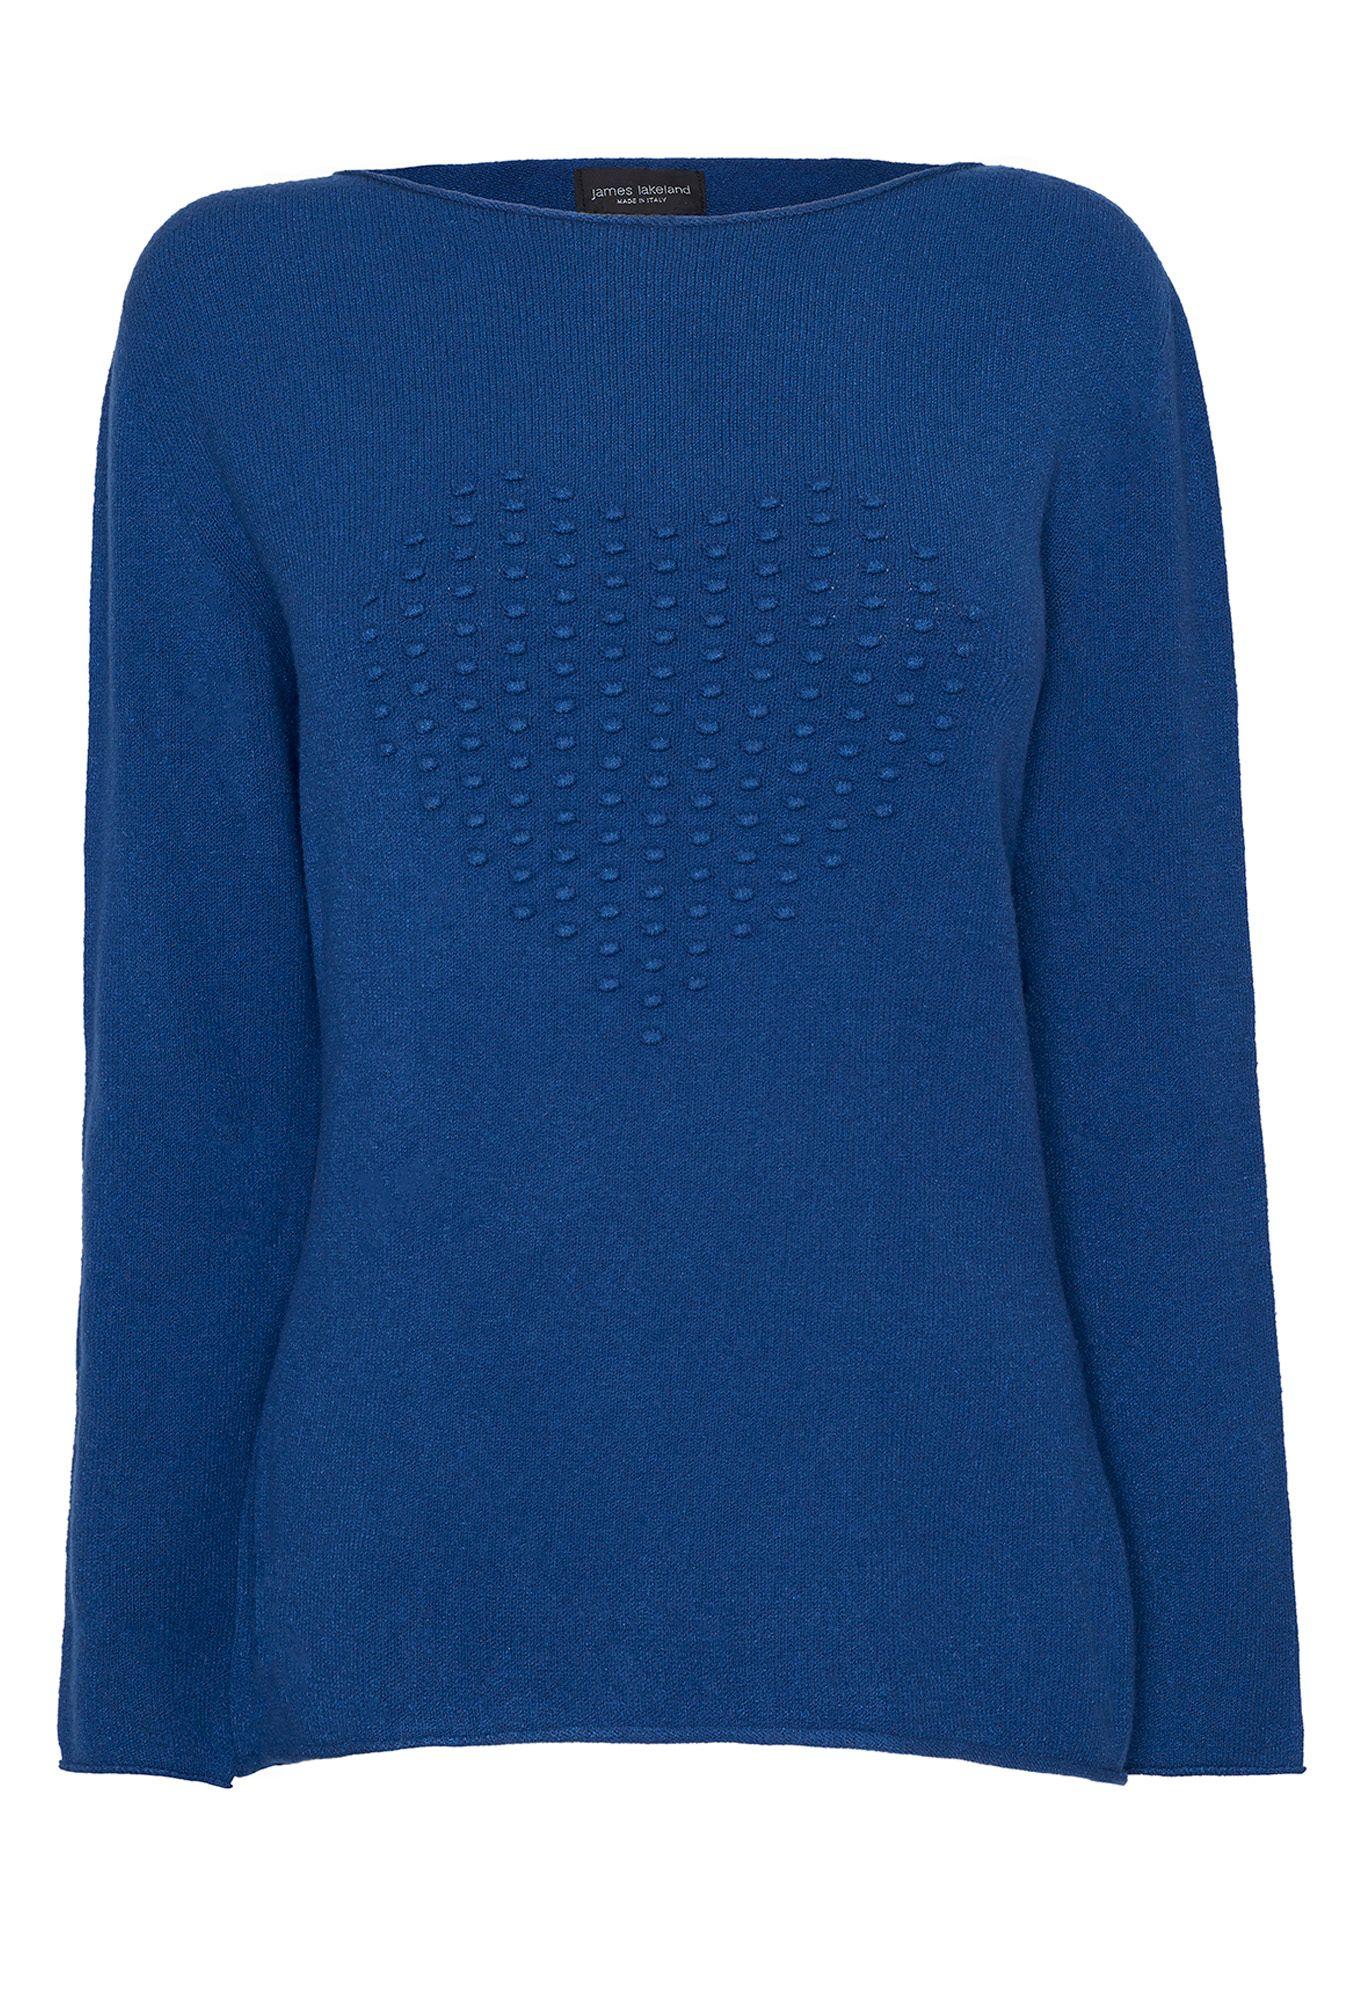 Knitting Pattern Jumper With Heart : James lakeland Heart Knit Jumper in Blue Lyst